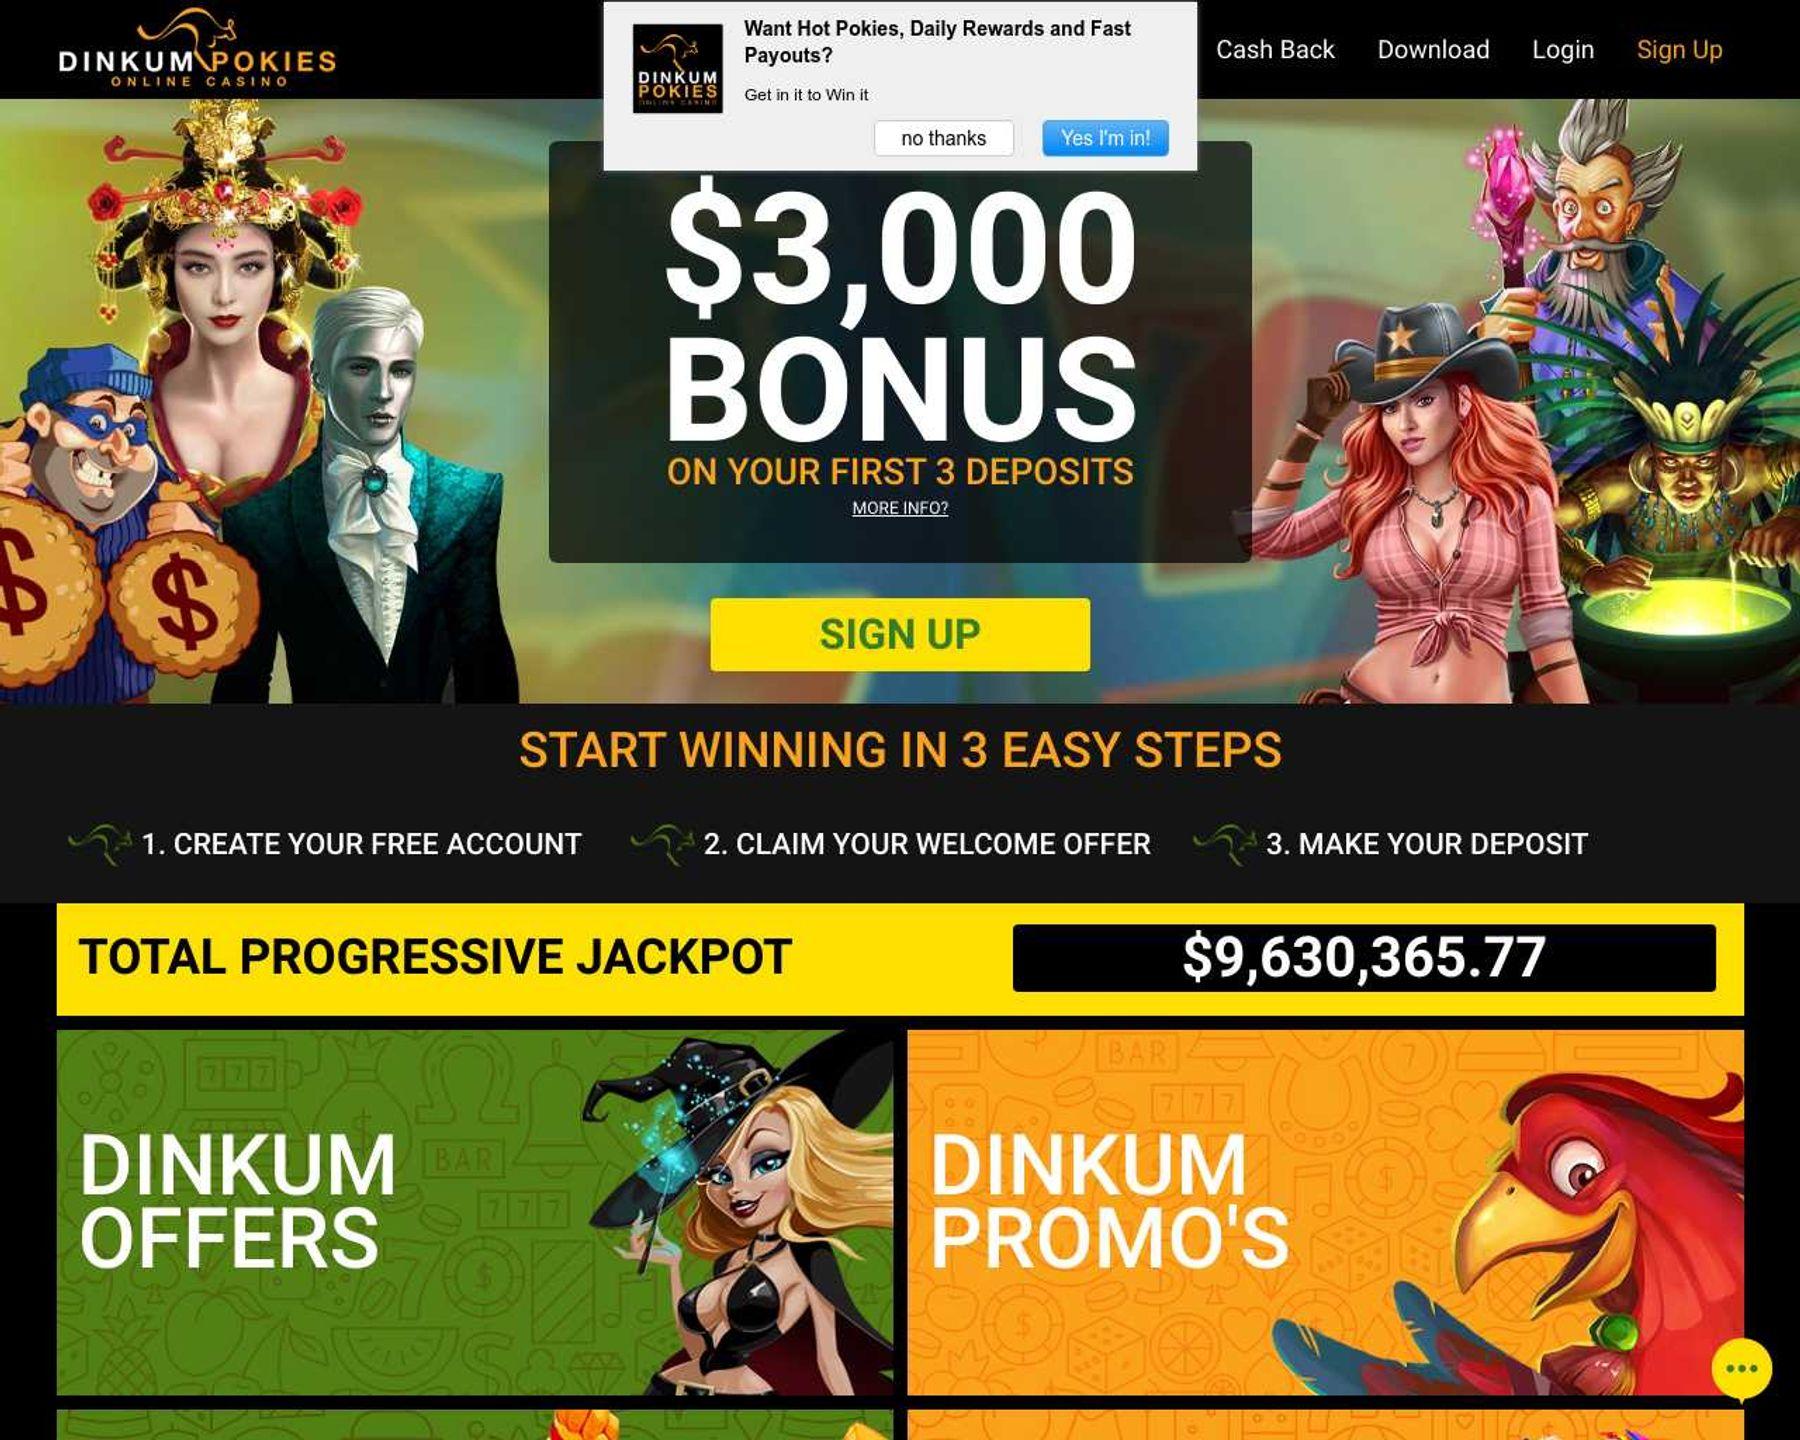 Dinkum Pokies Casino